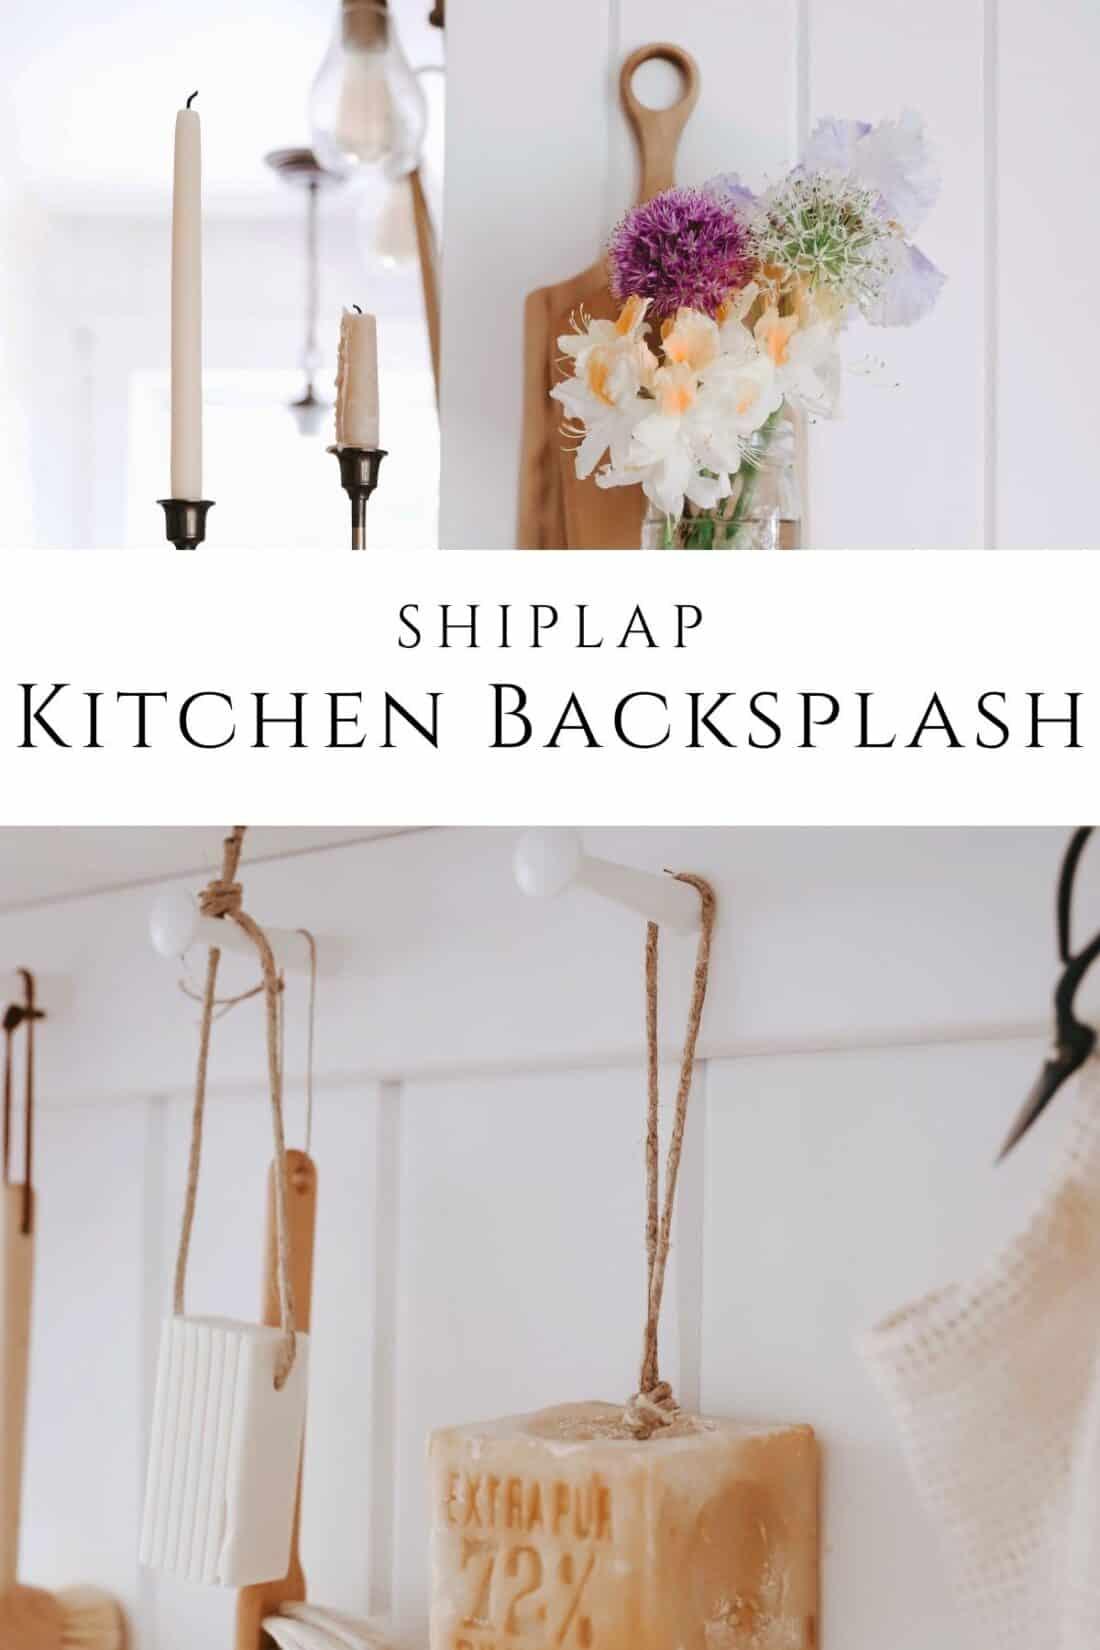 vertical shiplap kitchen backsplash with fresh flowers on open shelving